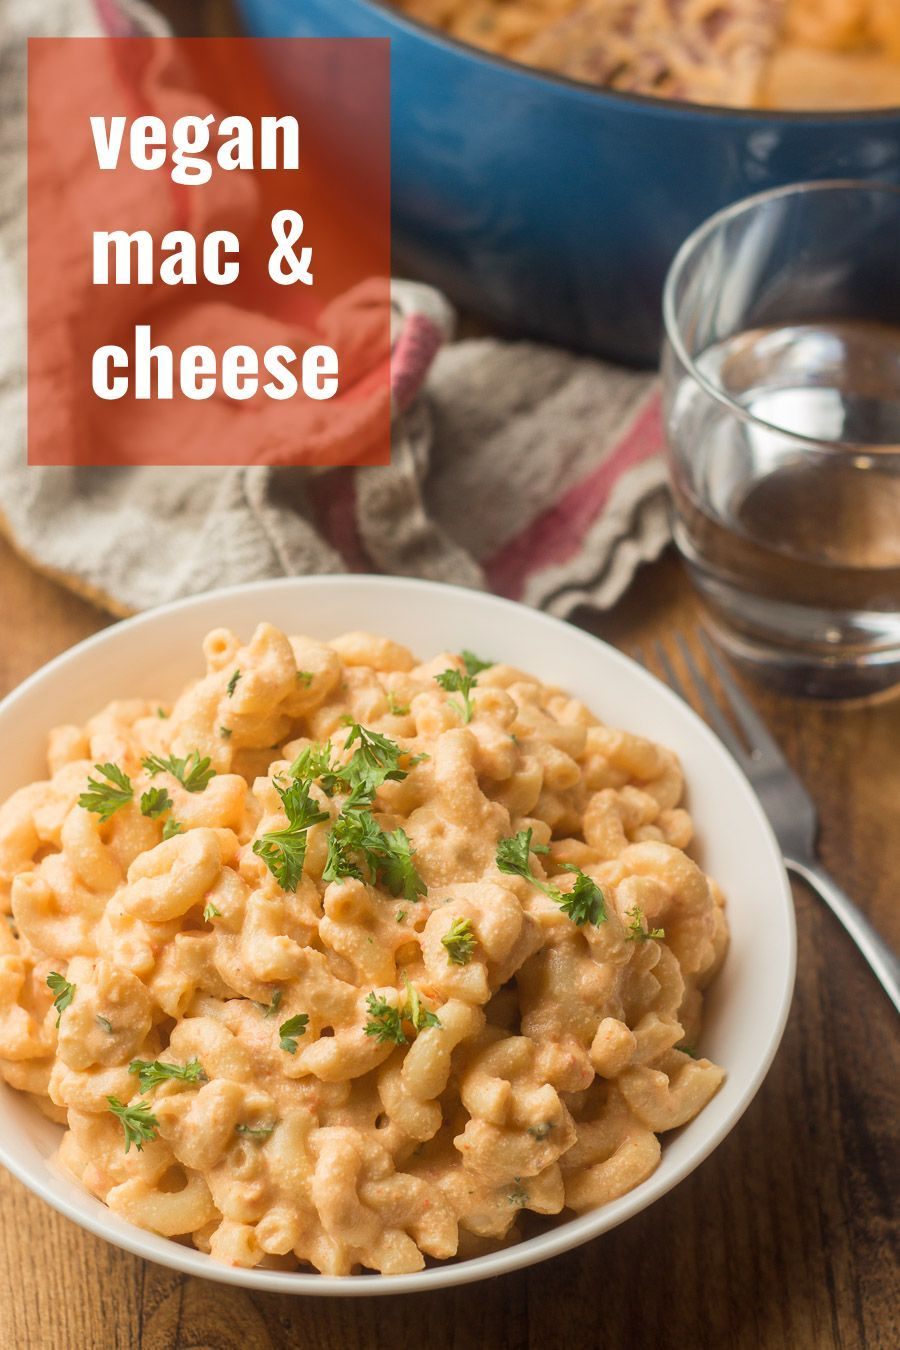 Classic Vegan Mac Cheese In 2020 Vegan Mac And Cheese Vegan Dinner Recipes Easy Vegan Side Dishes